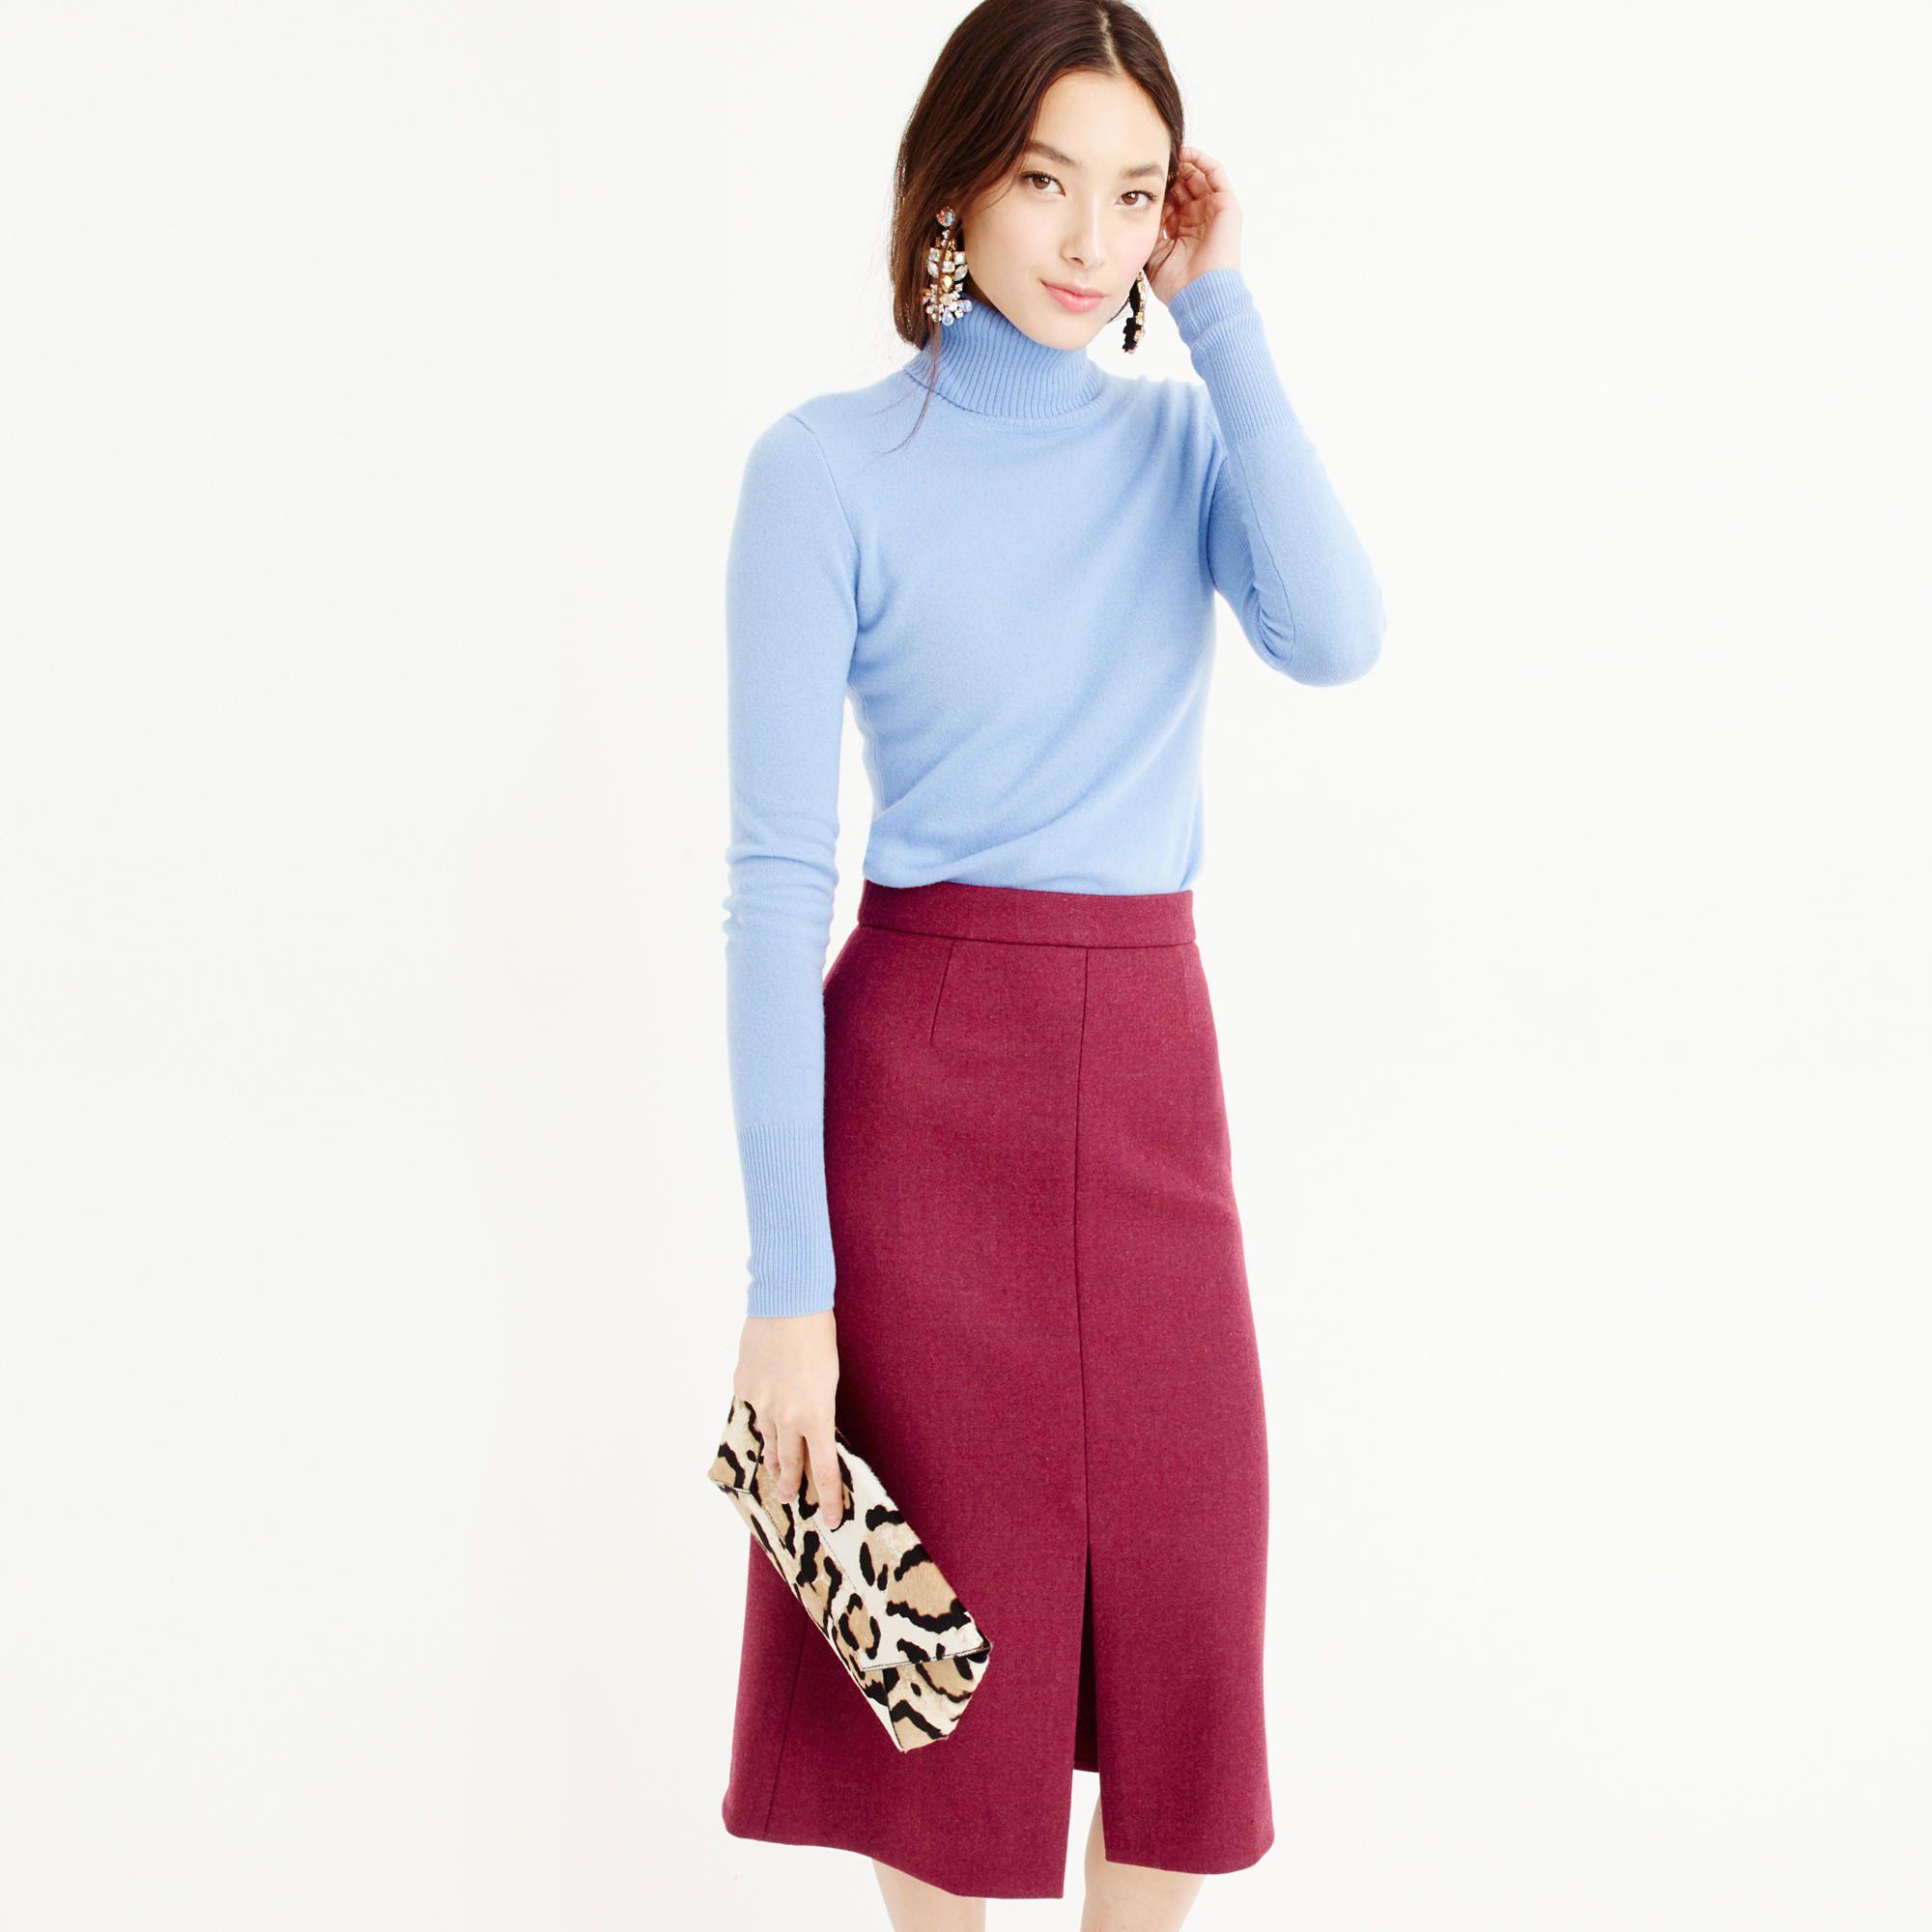 0f740978a5 A-line midi skirt in double-serge wool : A-line/Midi | J.Crew ...